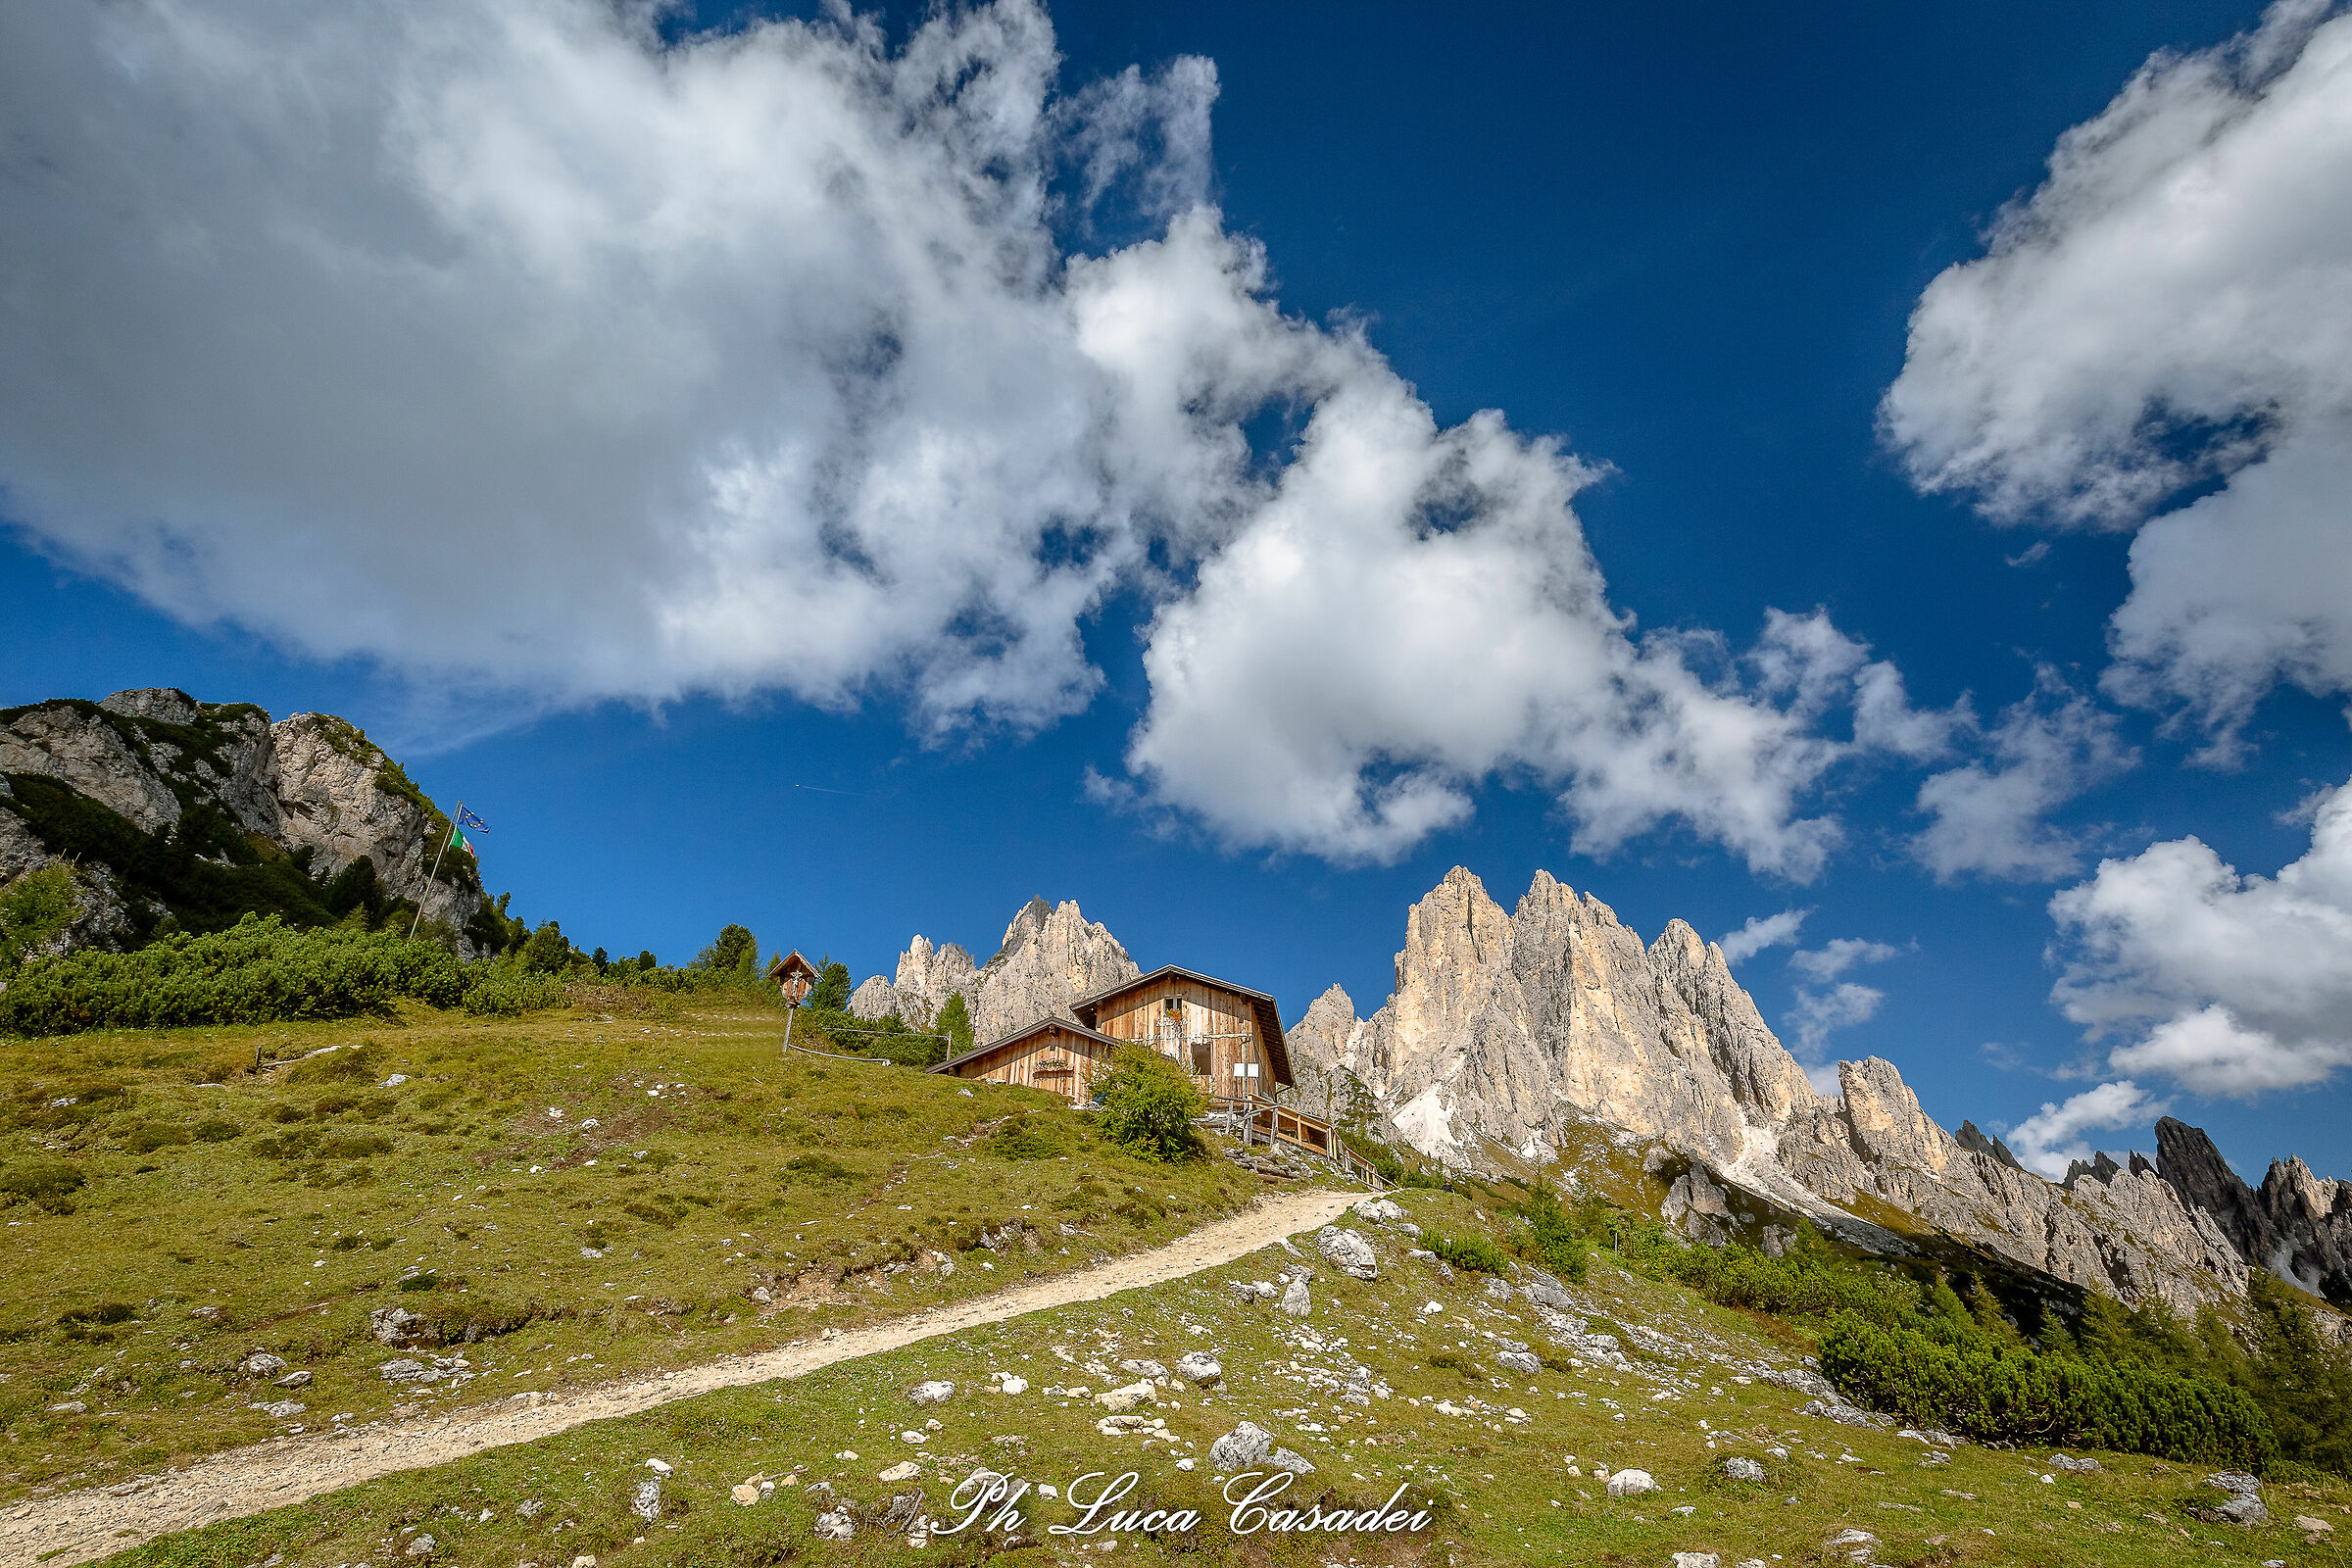 Dolomite Shelters...